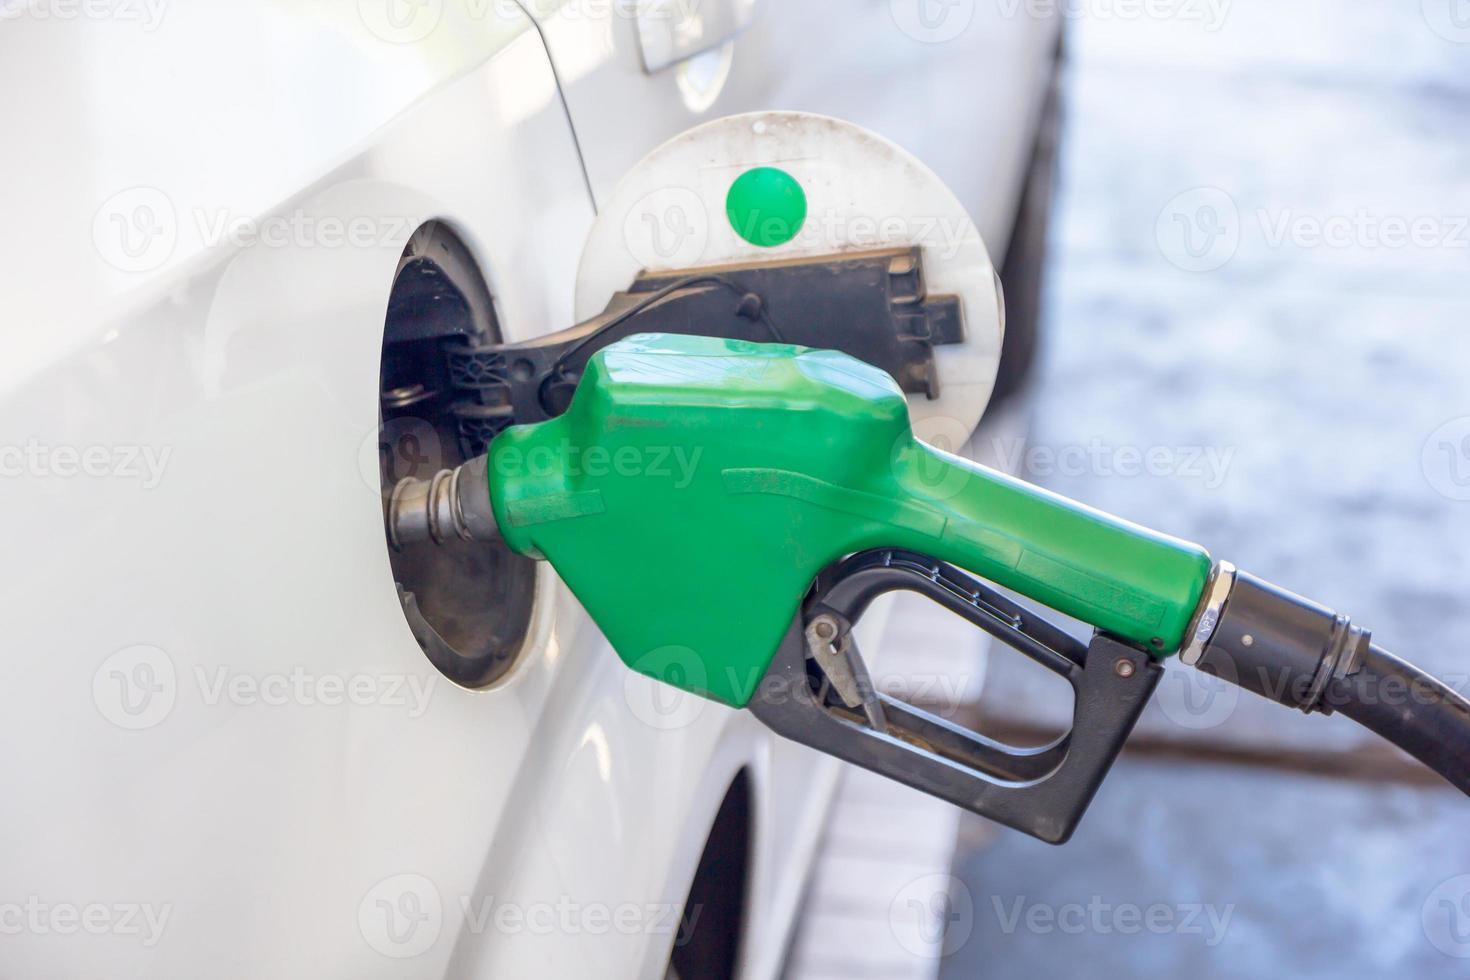 benzinepomp vullen close-up foto